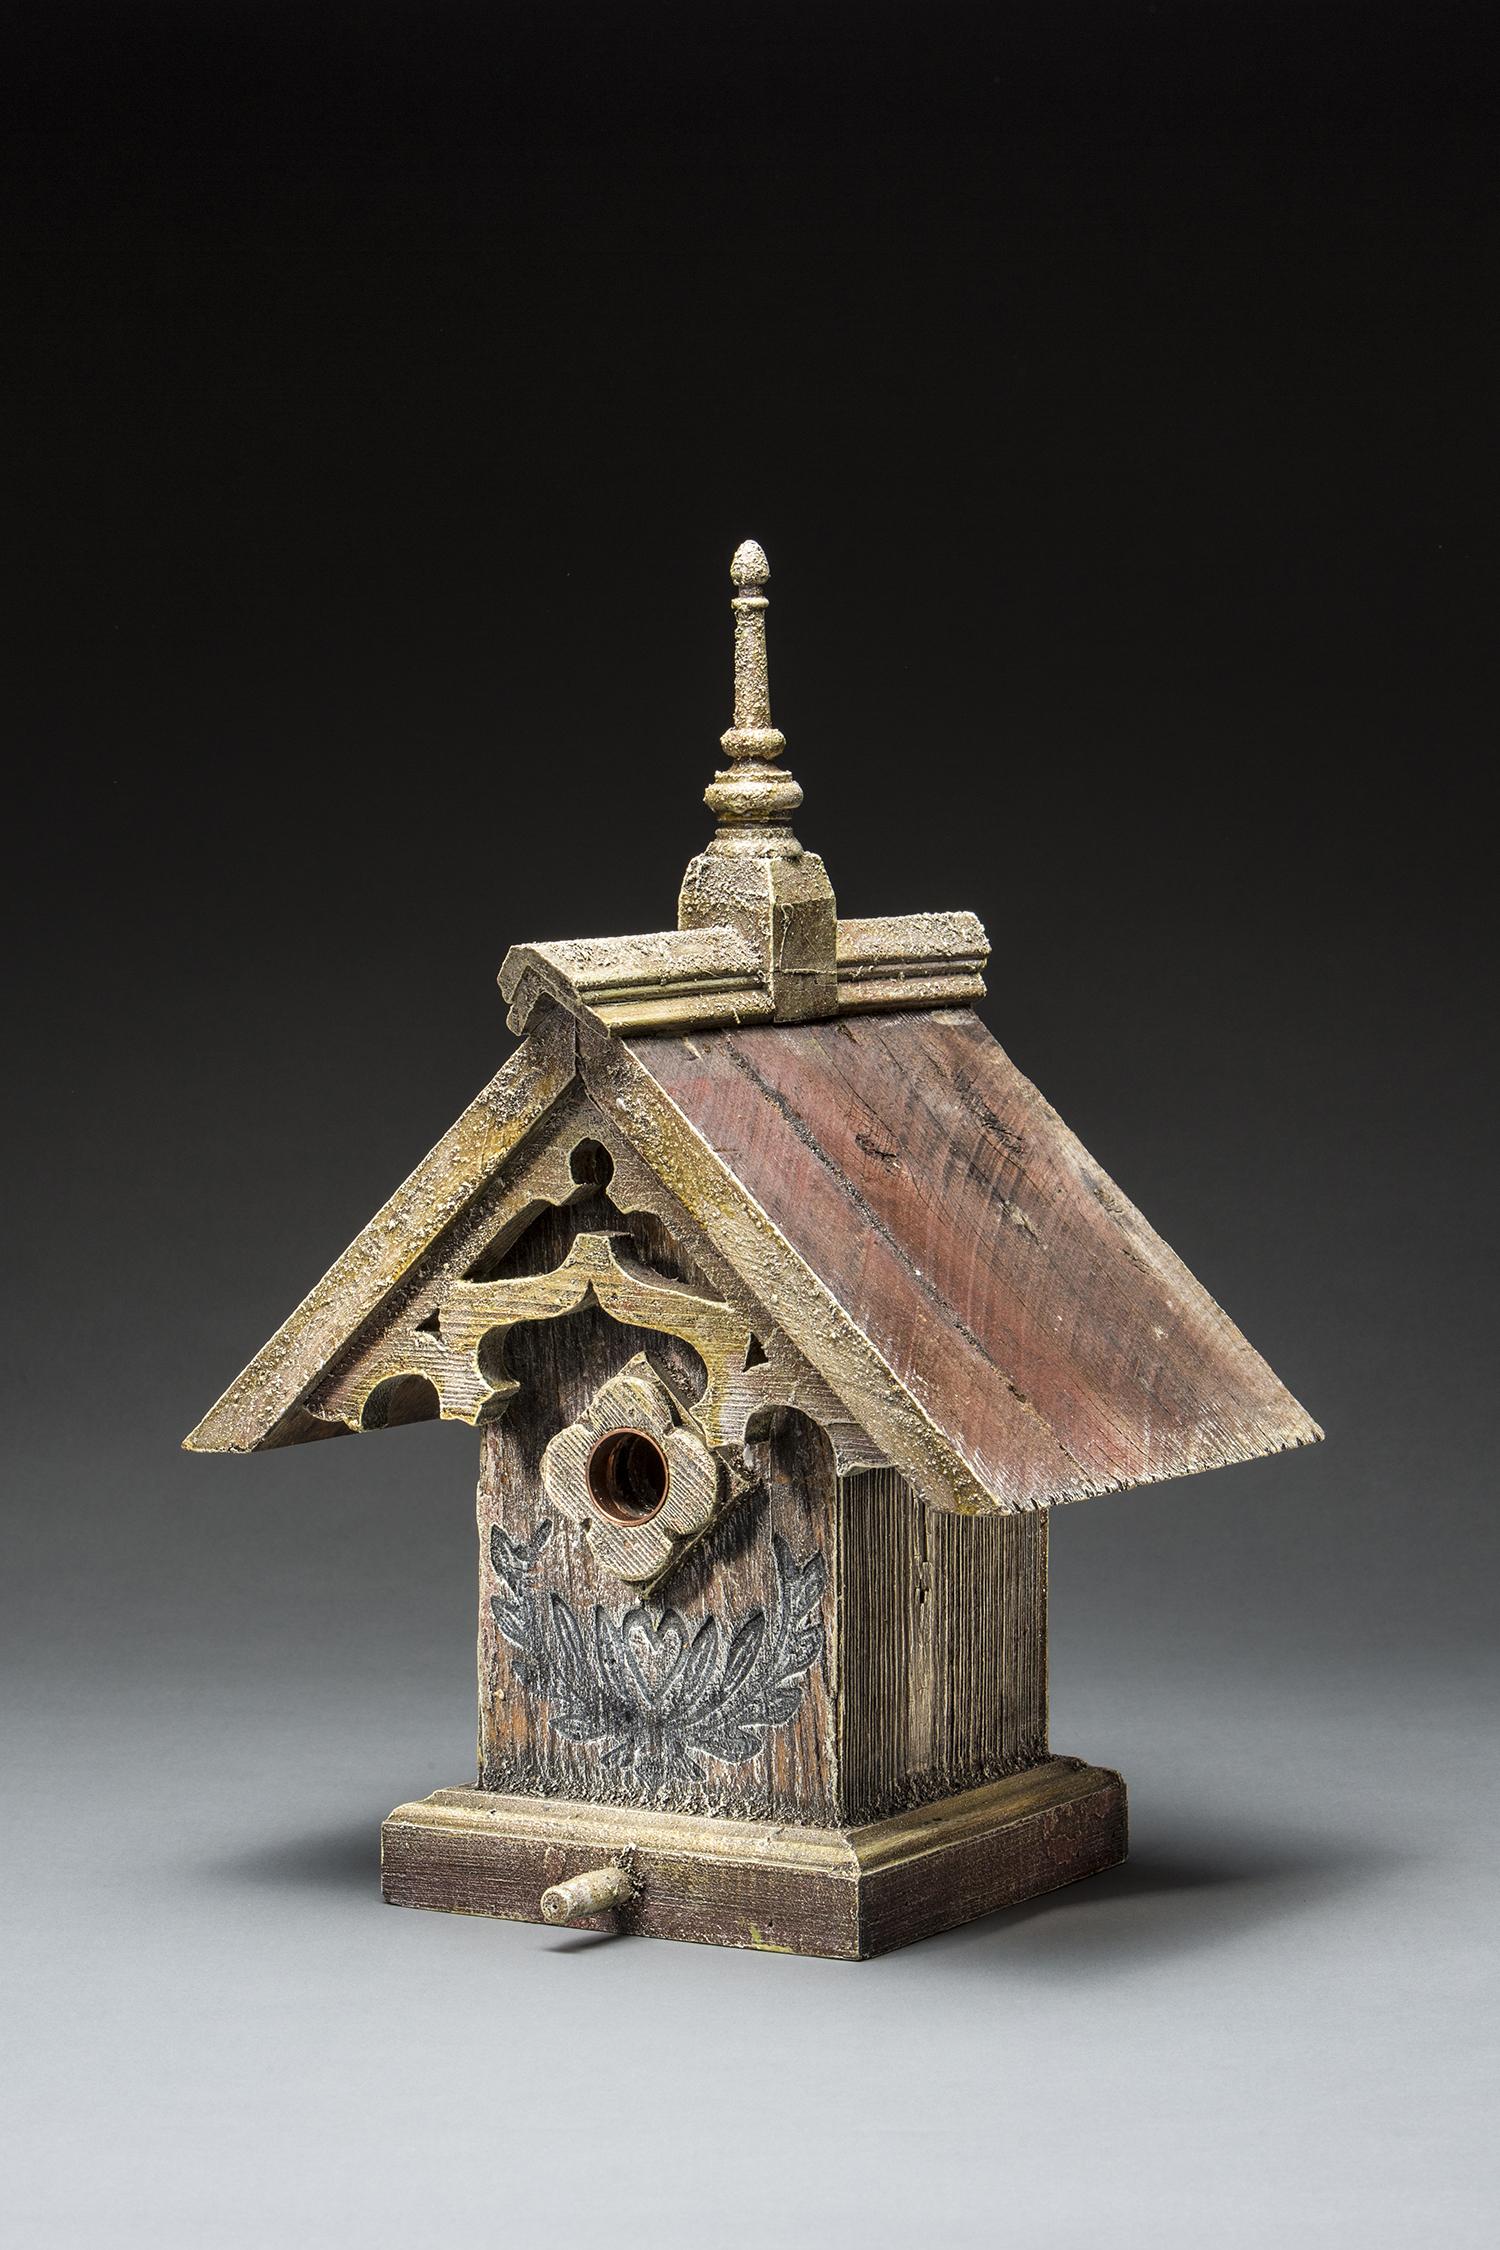 Gothic Birdhouse Barns Into Birdhouses